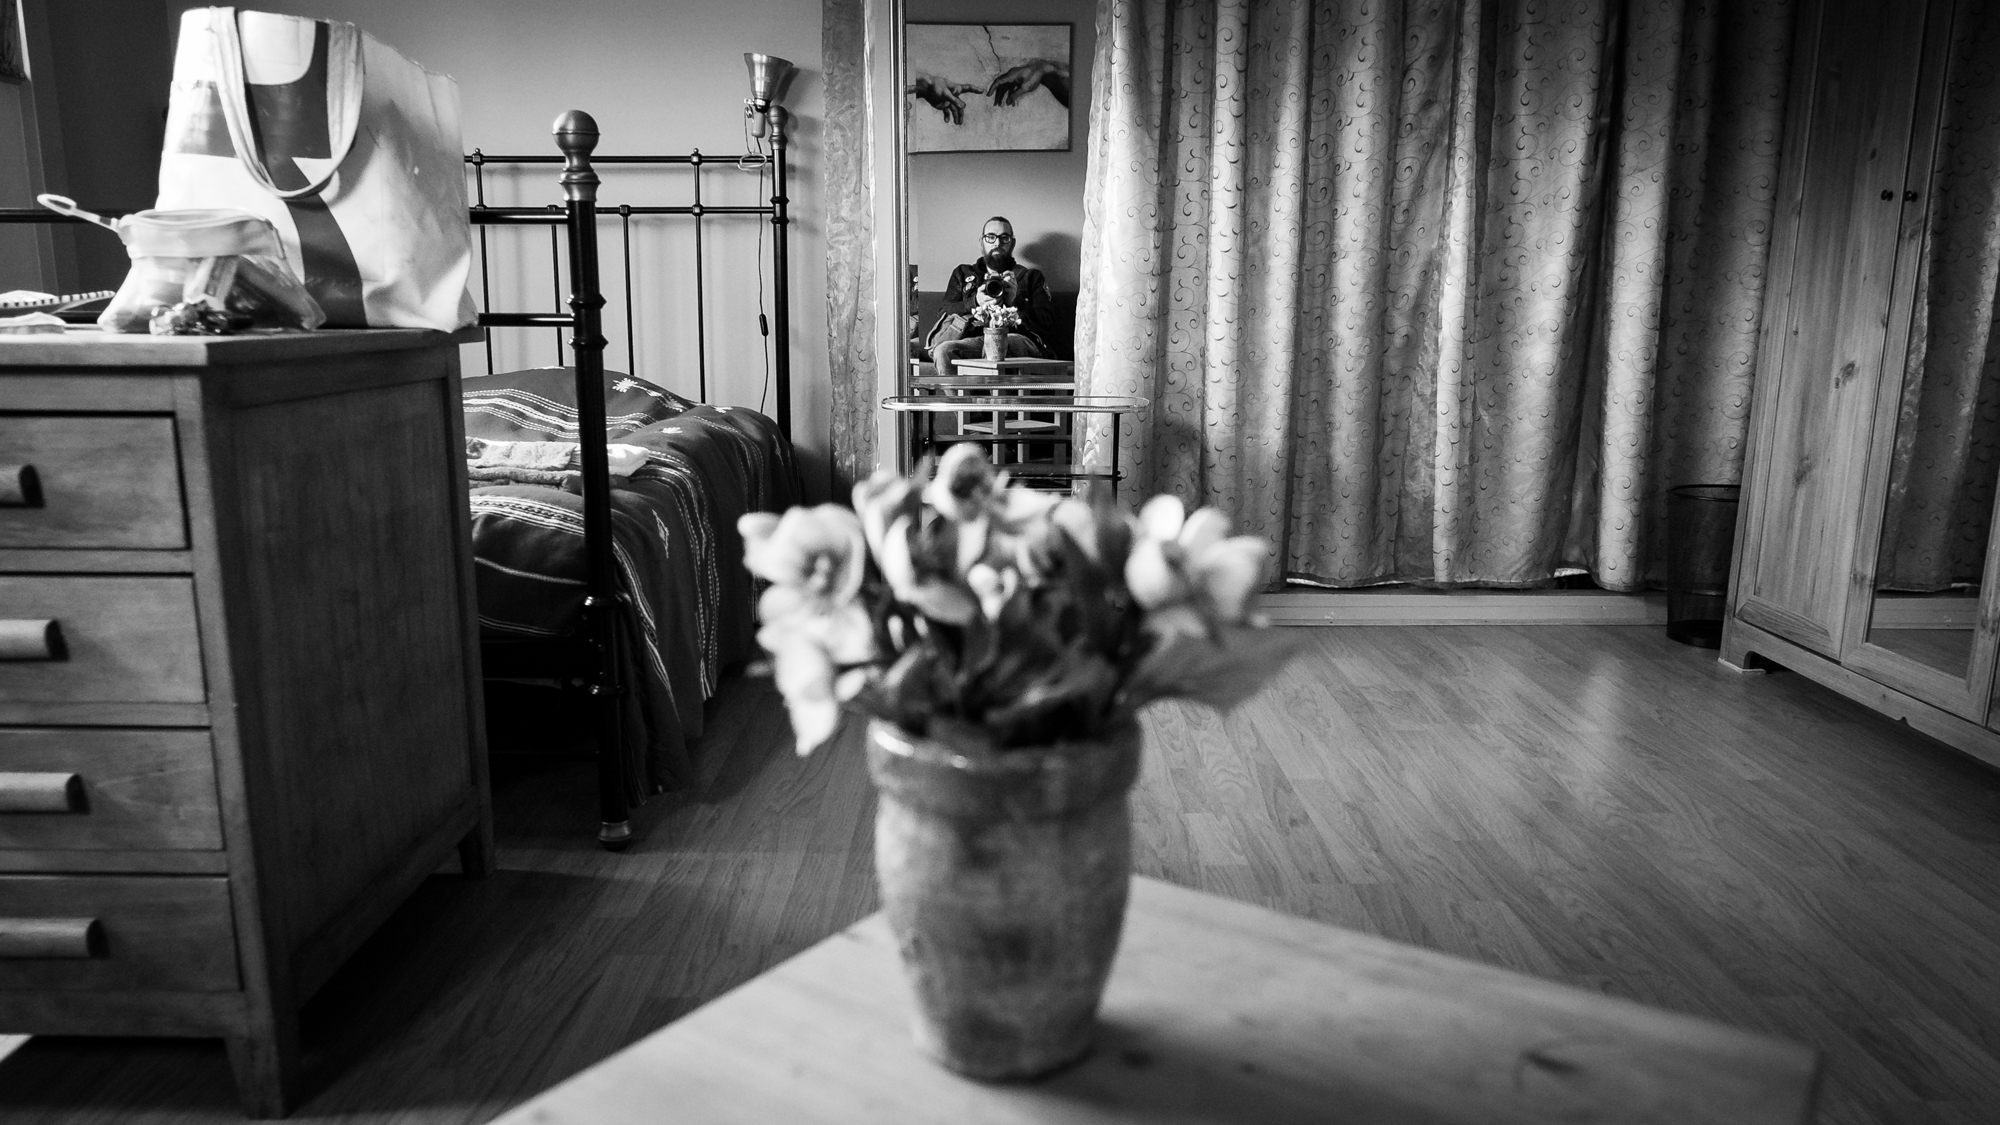 Selfportrait_08-04-2016_WilliamvanderVoort